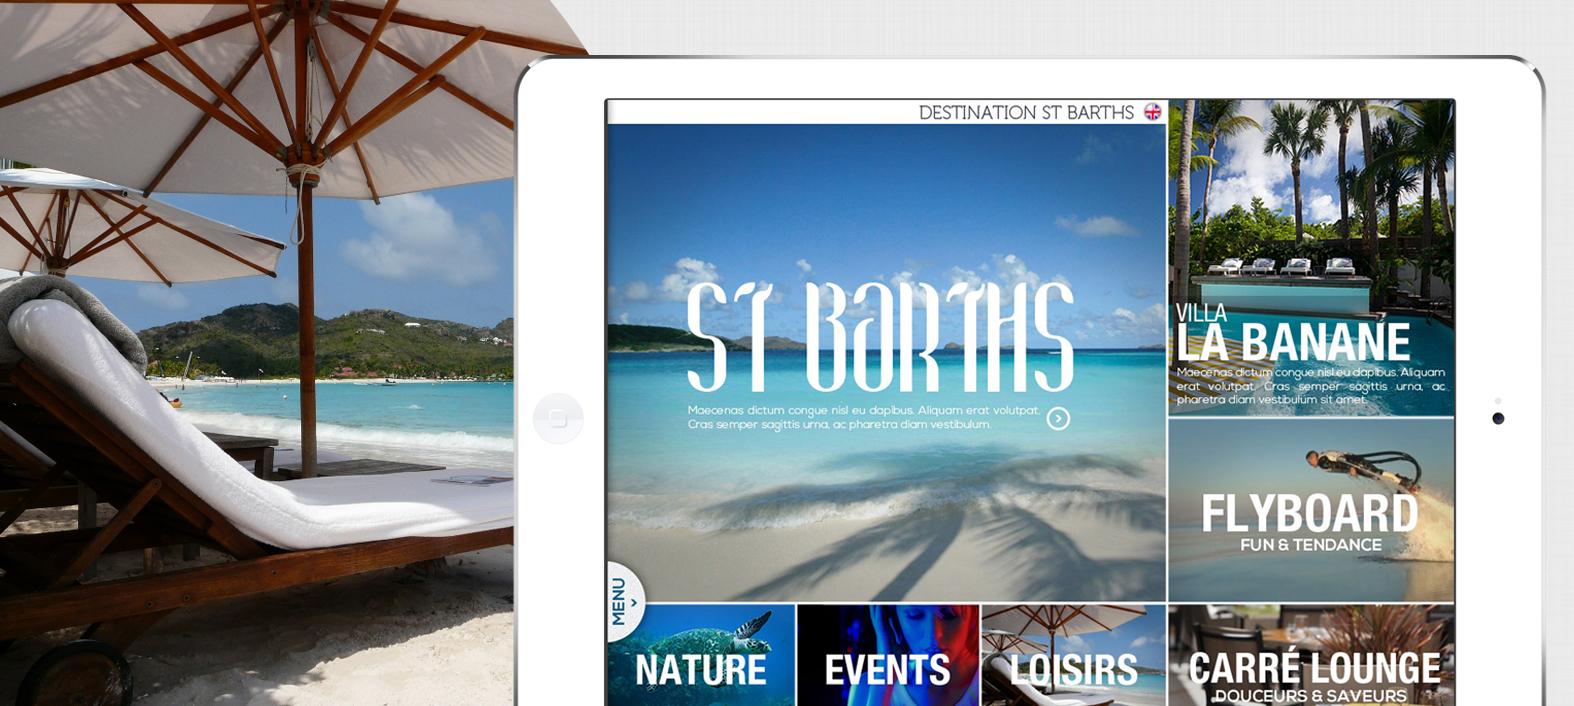 App St Barths